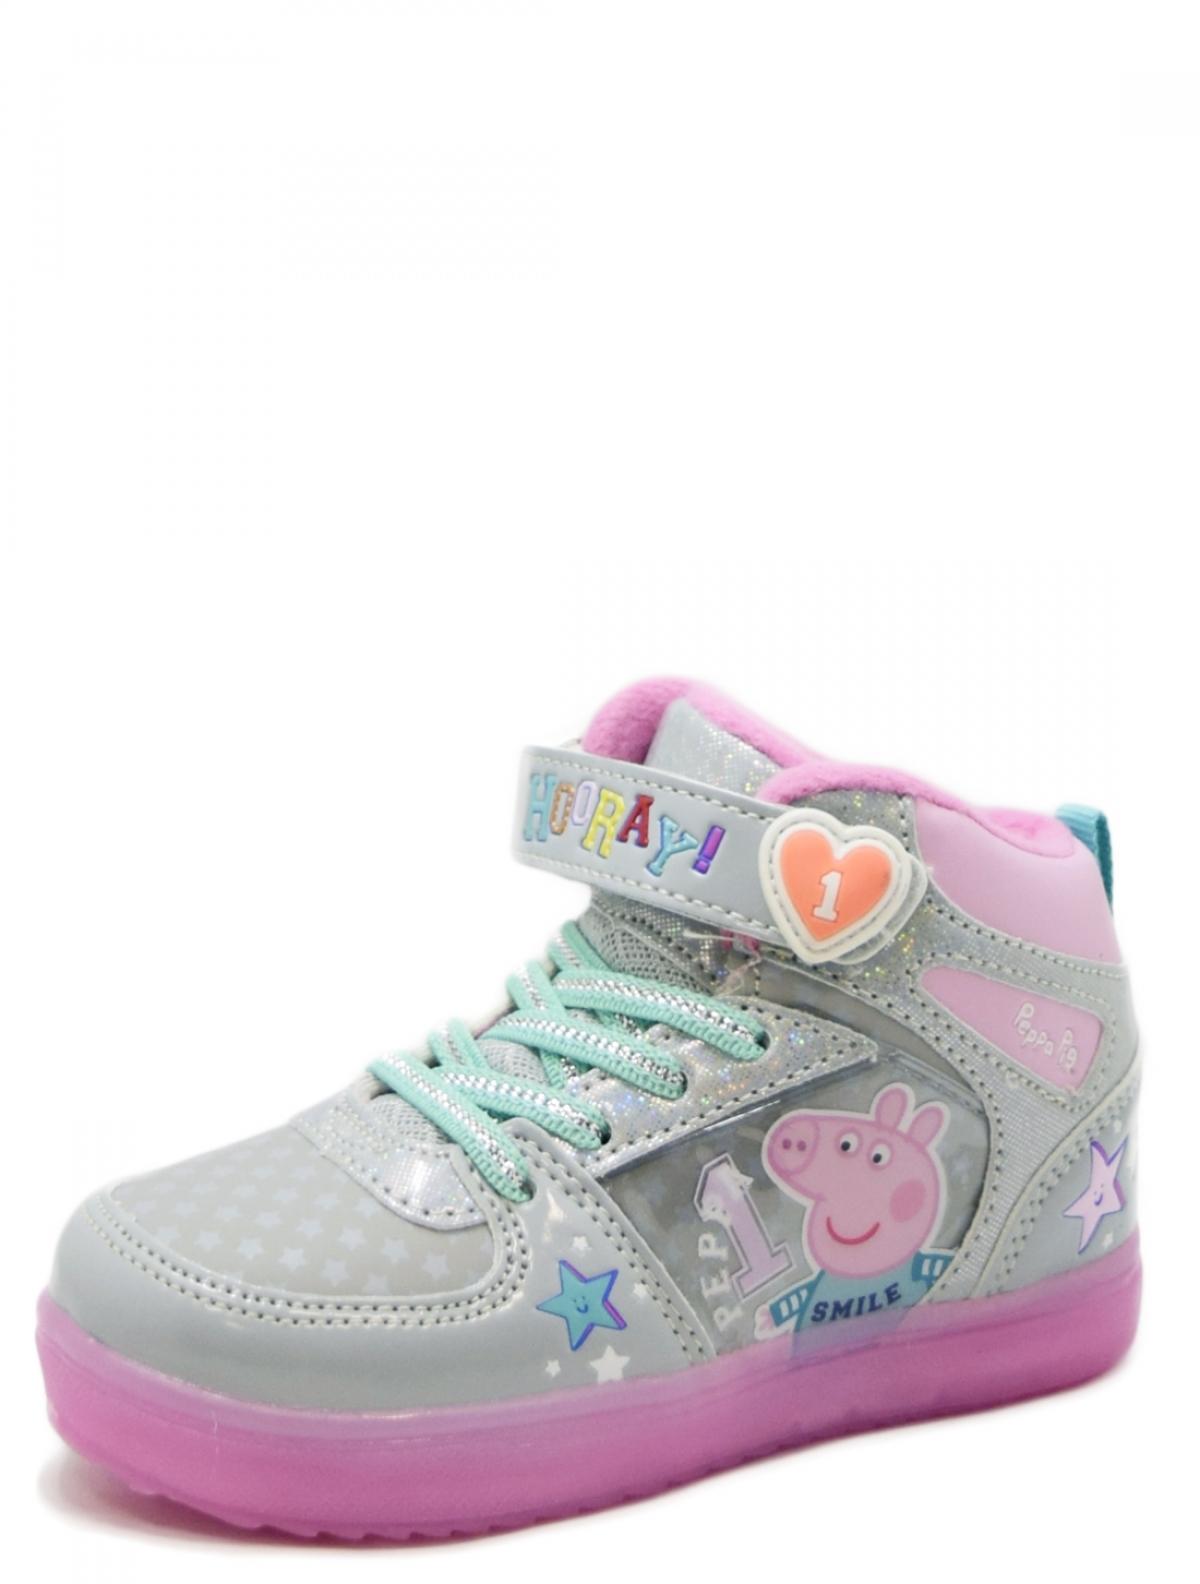 Peppa Pig 6850B кроссовки для девочки